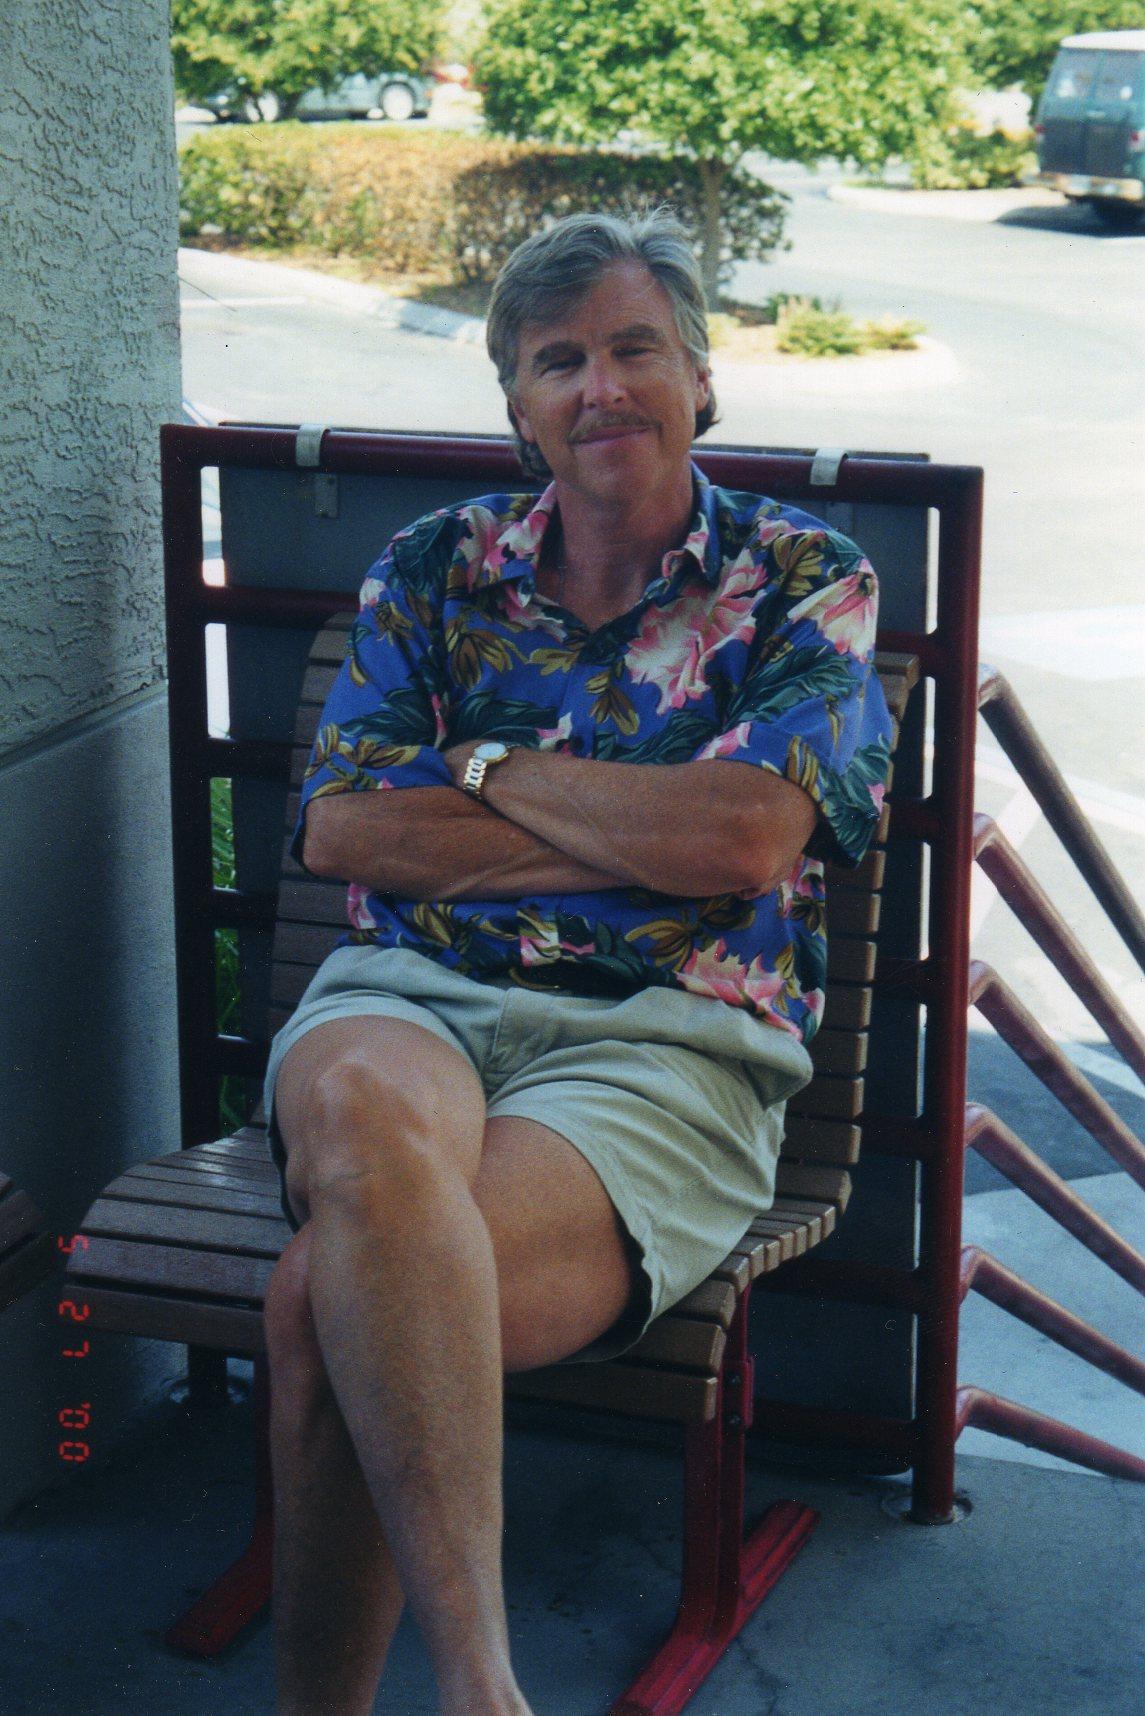 Steven Van Dyke